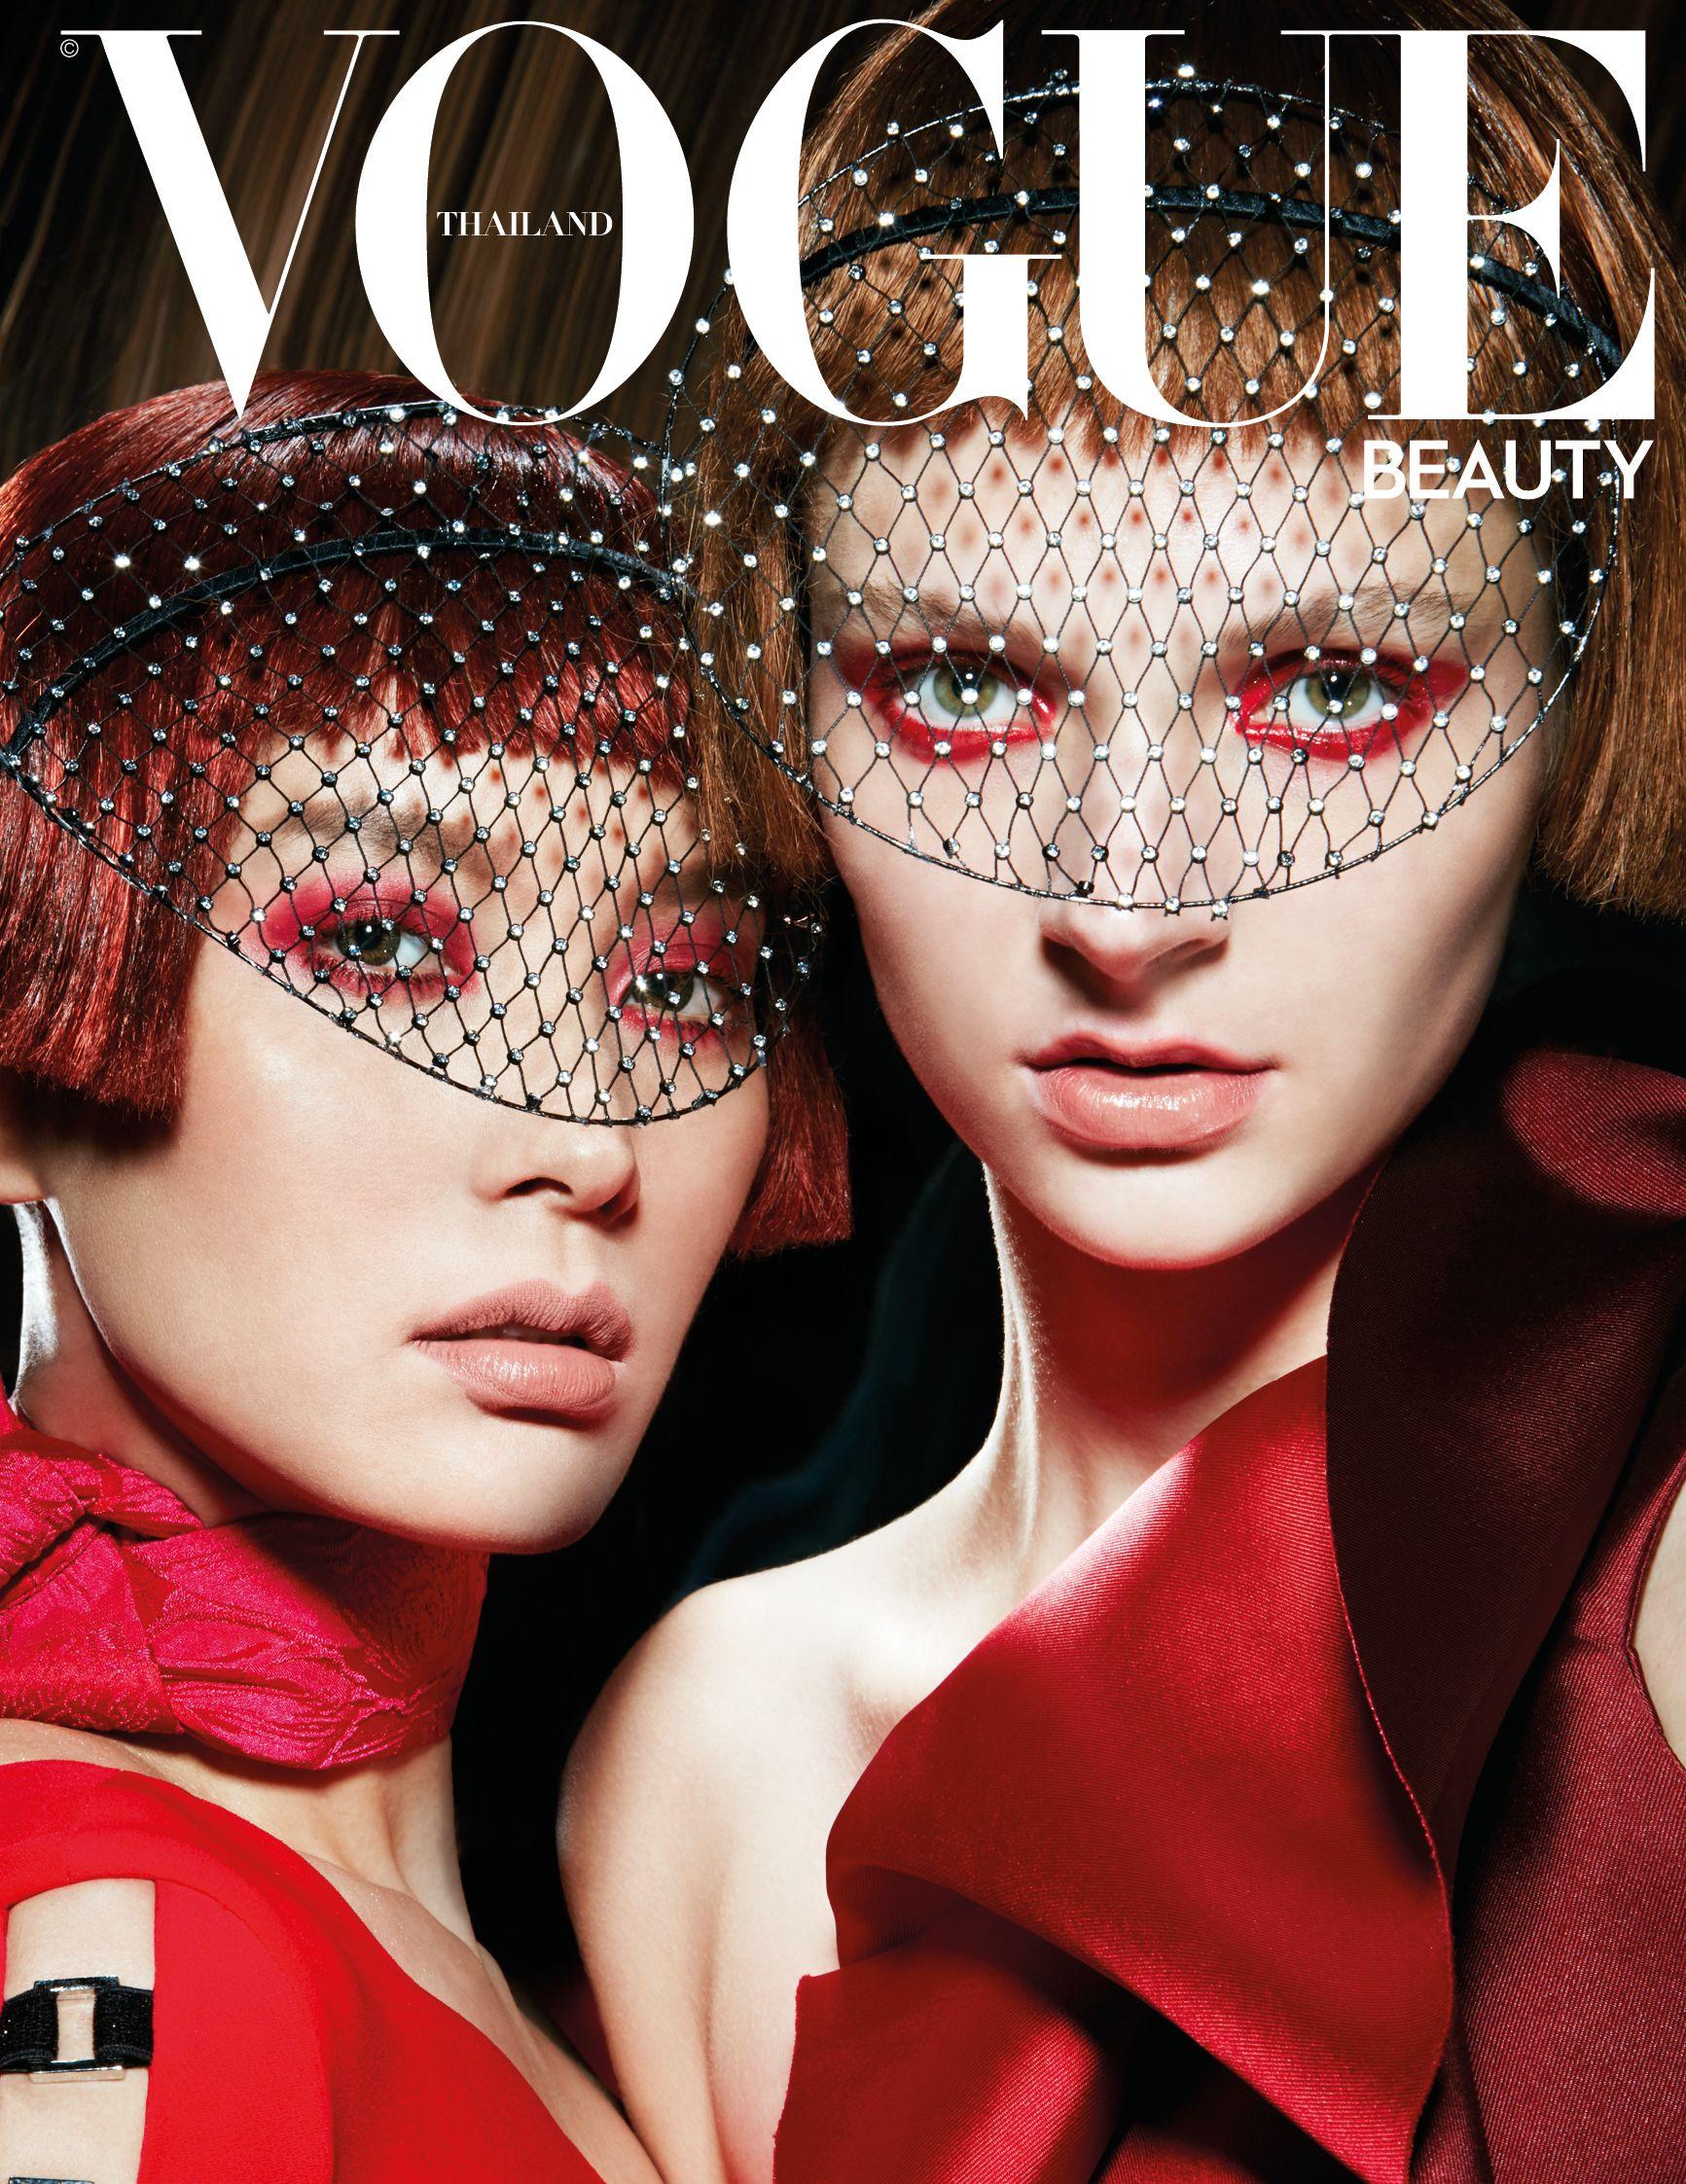 Картинка из модного журнала